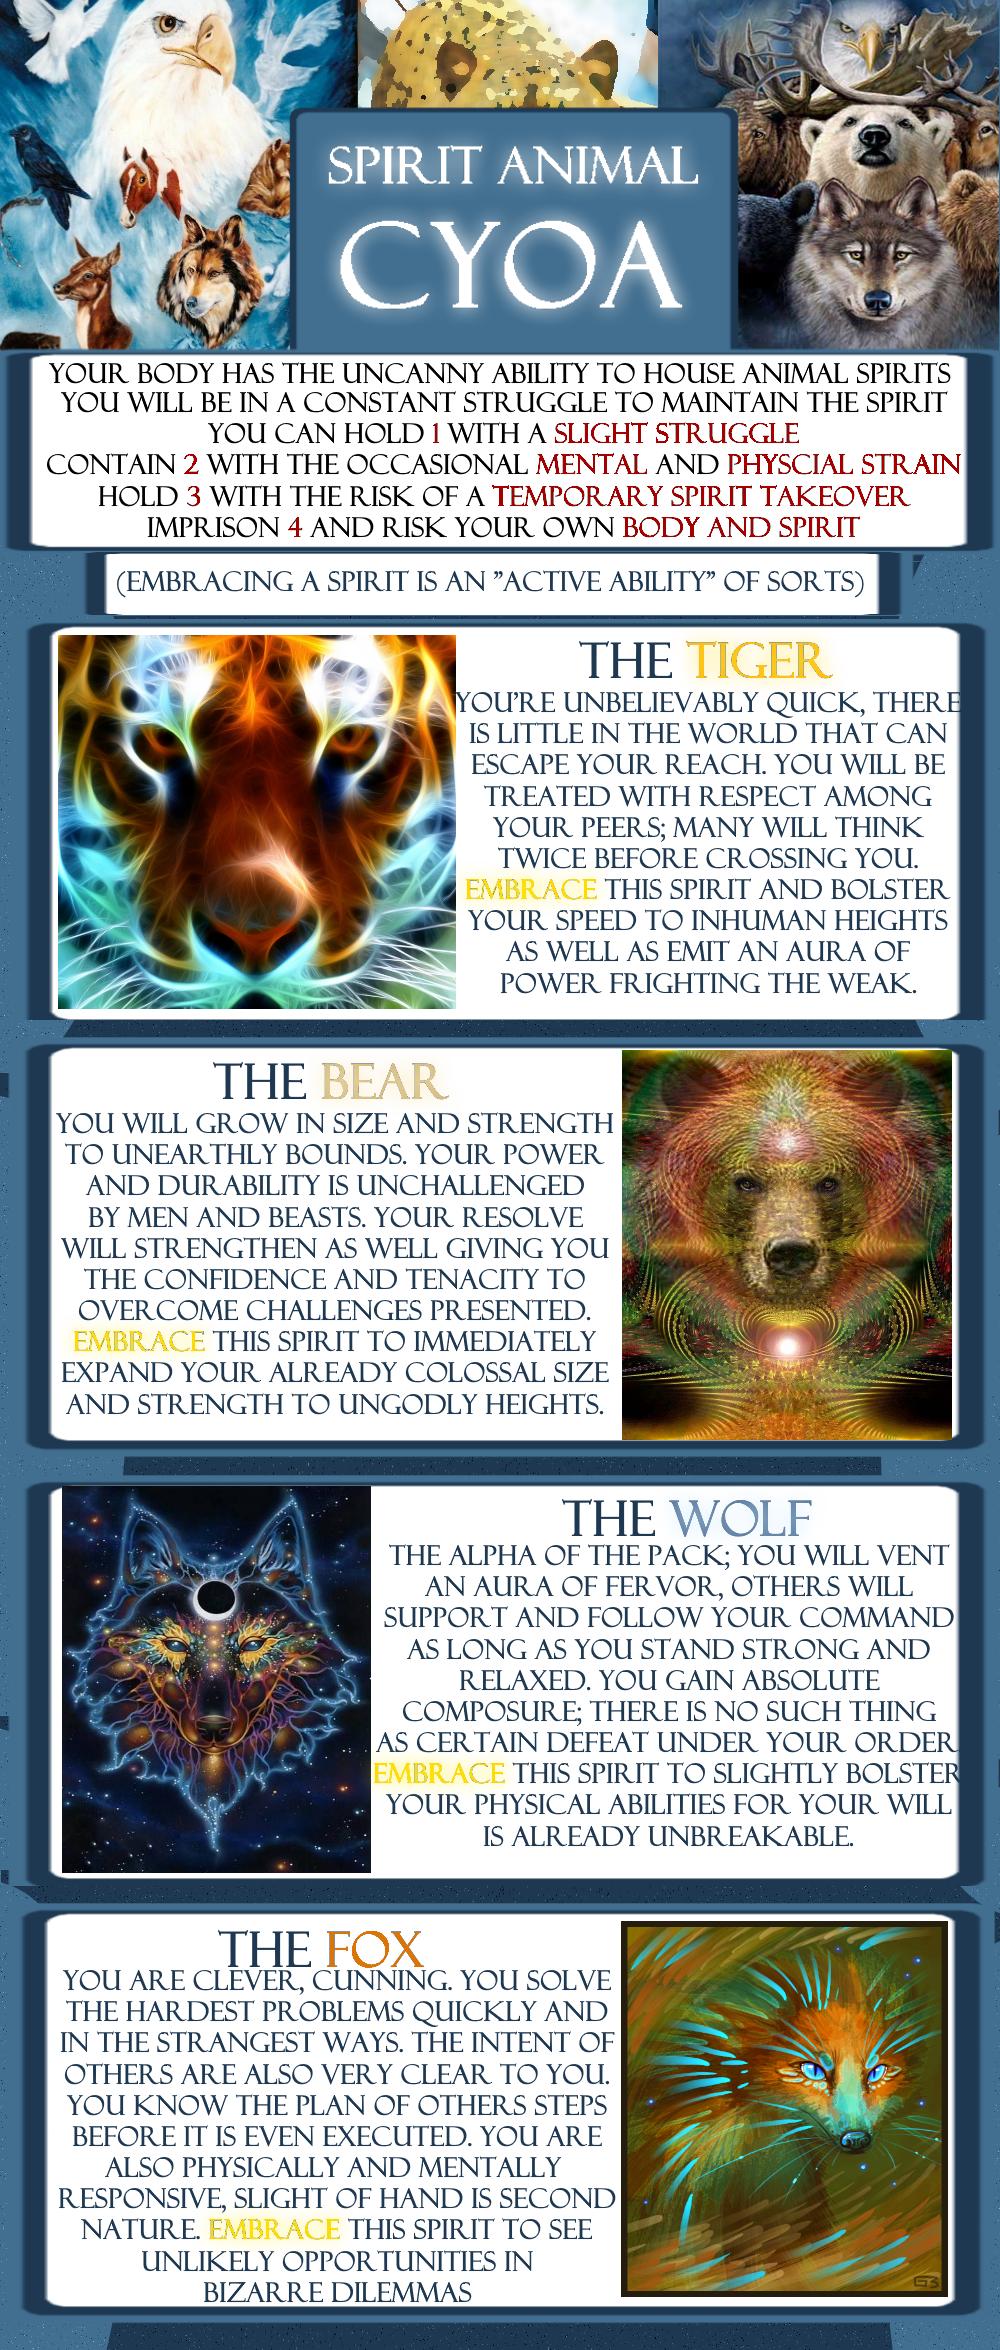 Animal Spirit CYOA in 2020 Cyoa, Spirit animal, Create